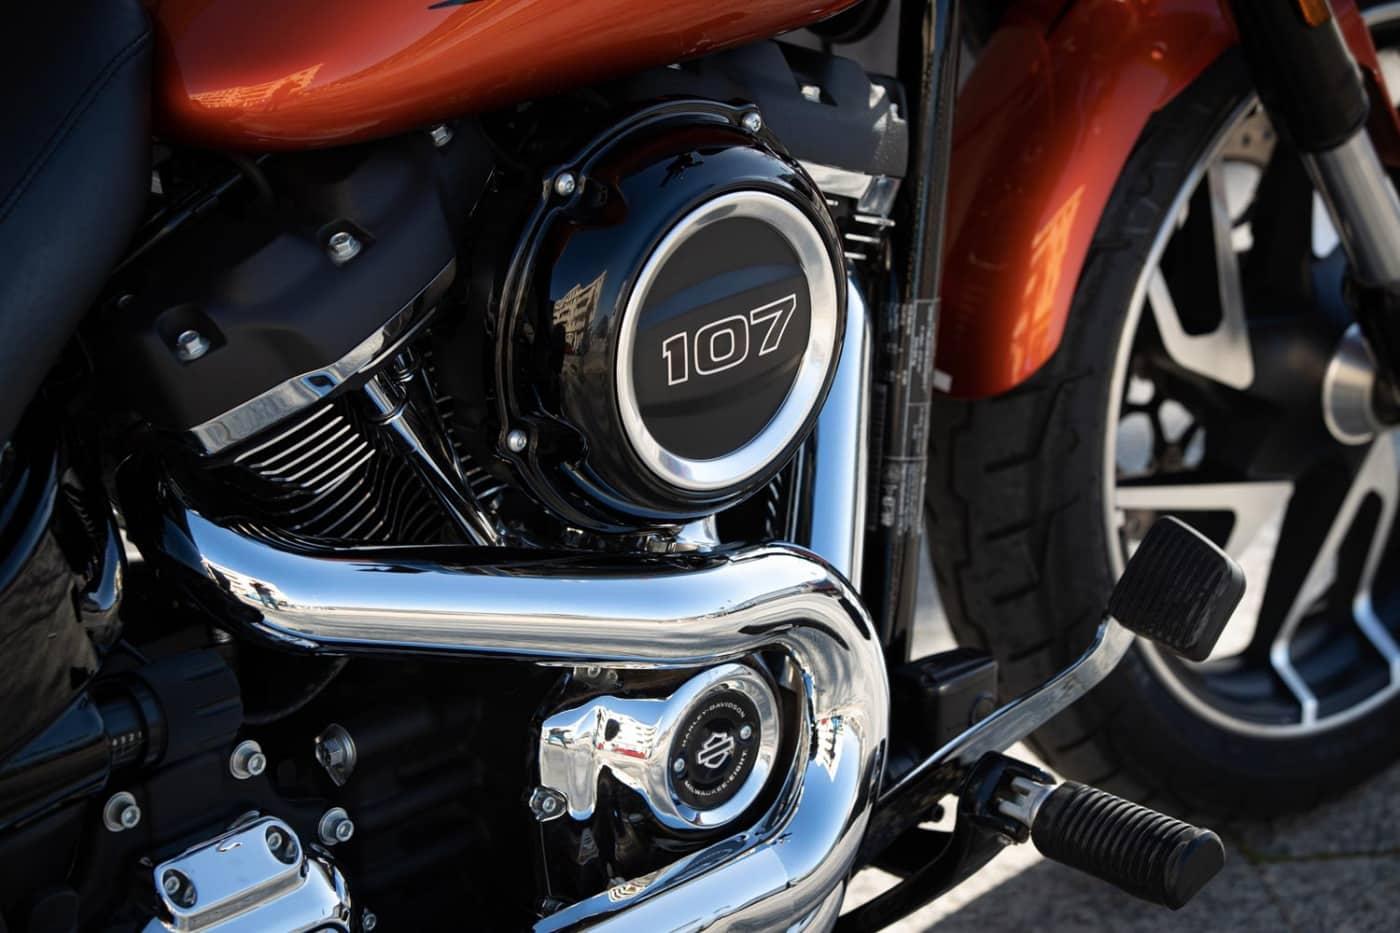 2020 Sport Glide 107 Milwaukee-Eight Motor